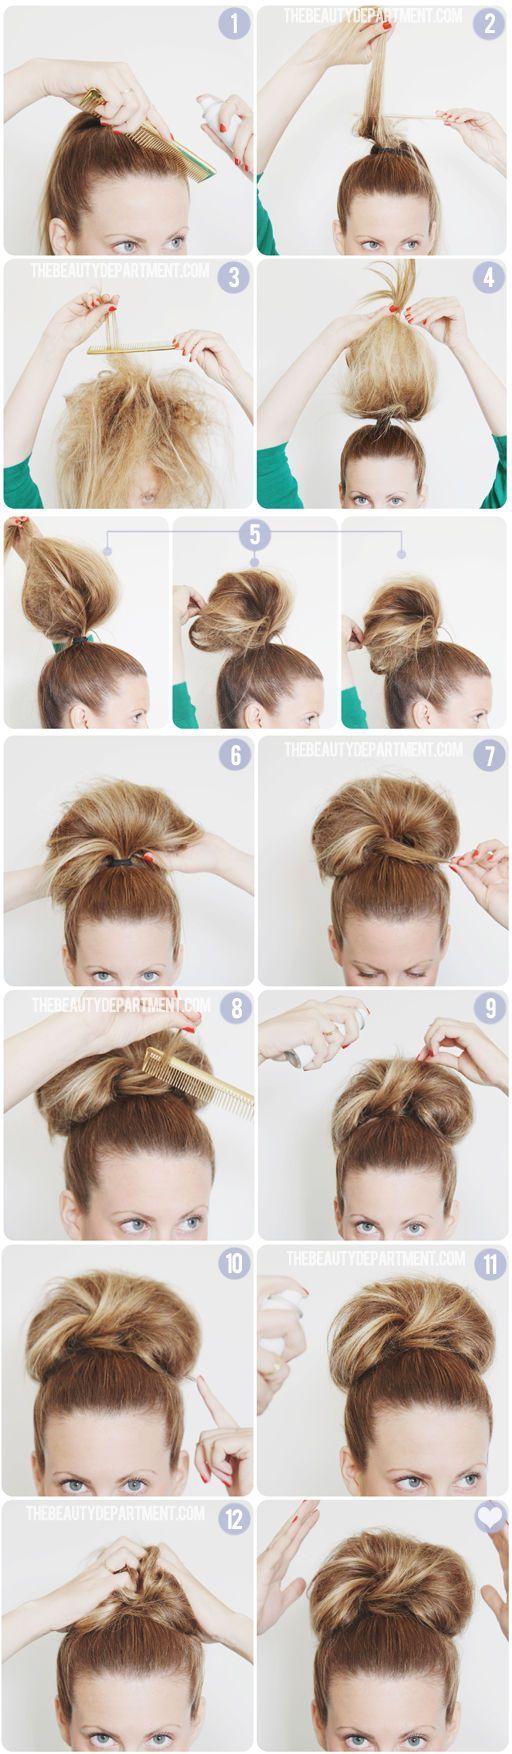 GIANT BUN TUTORIAL | Hair style, Big bun and Bun tutorials